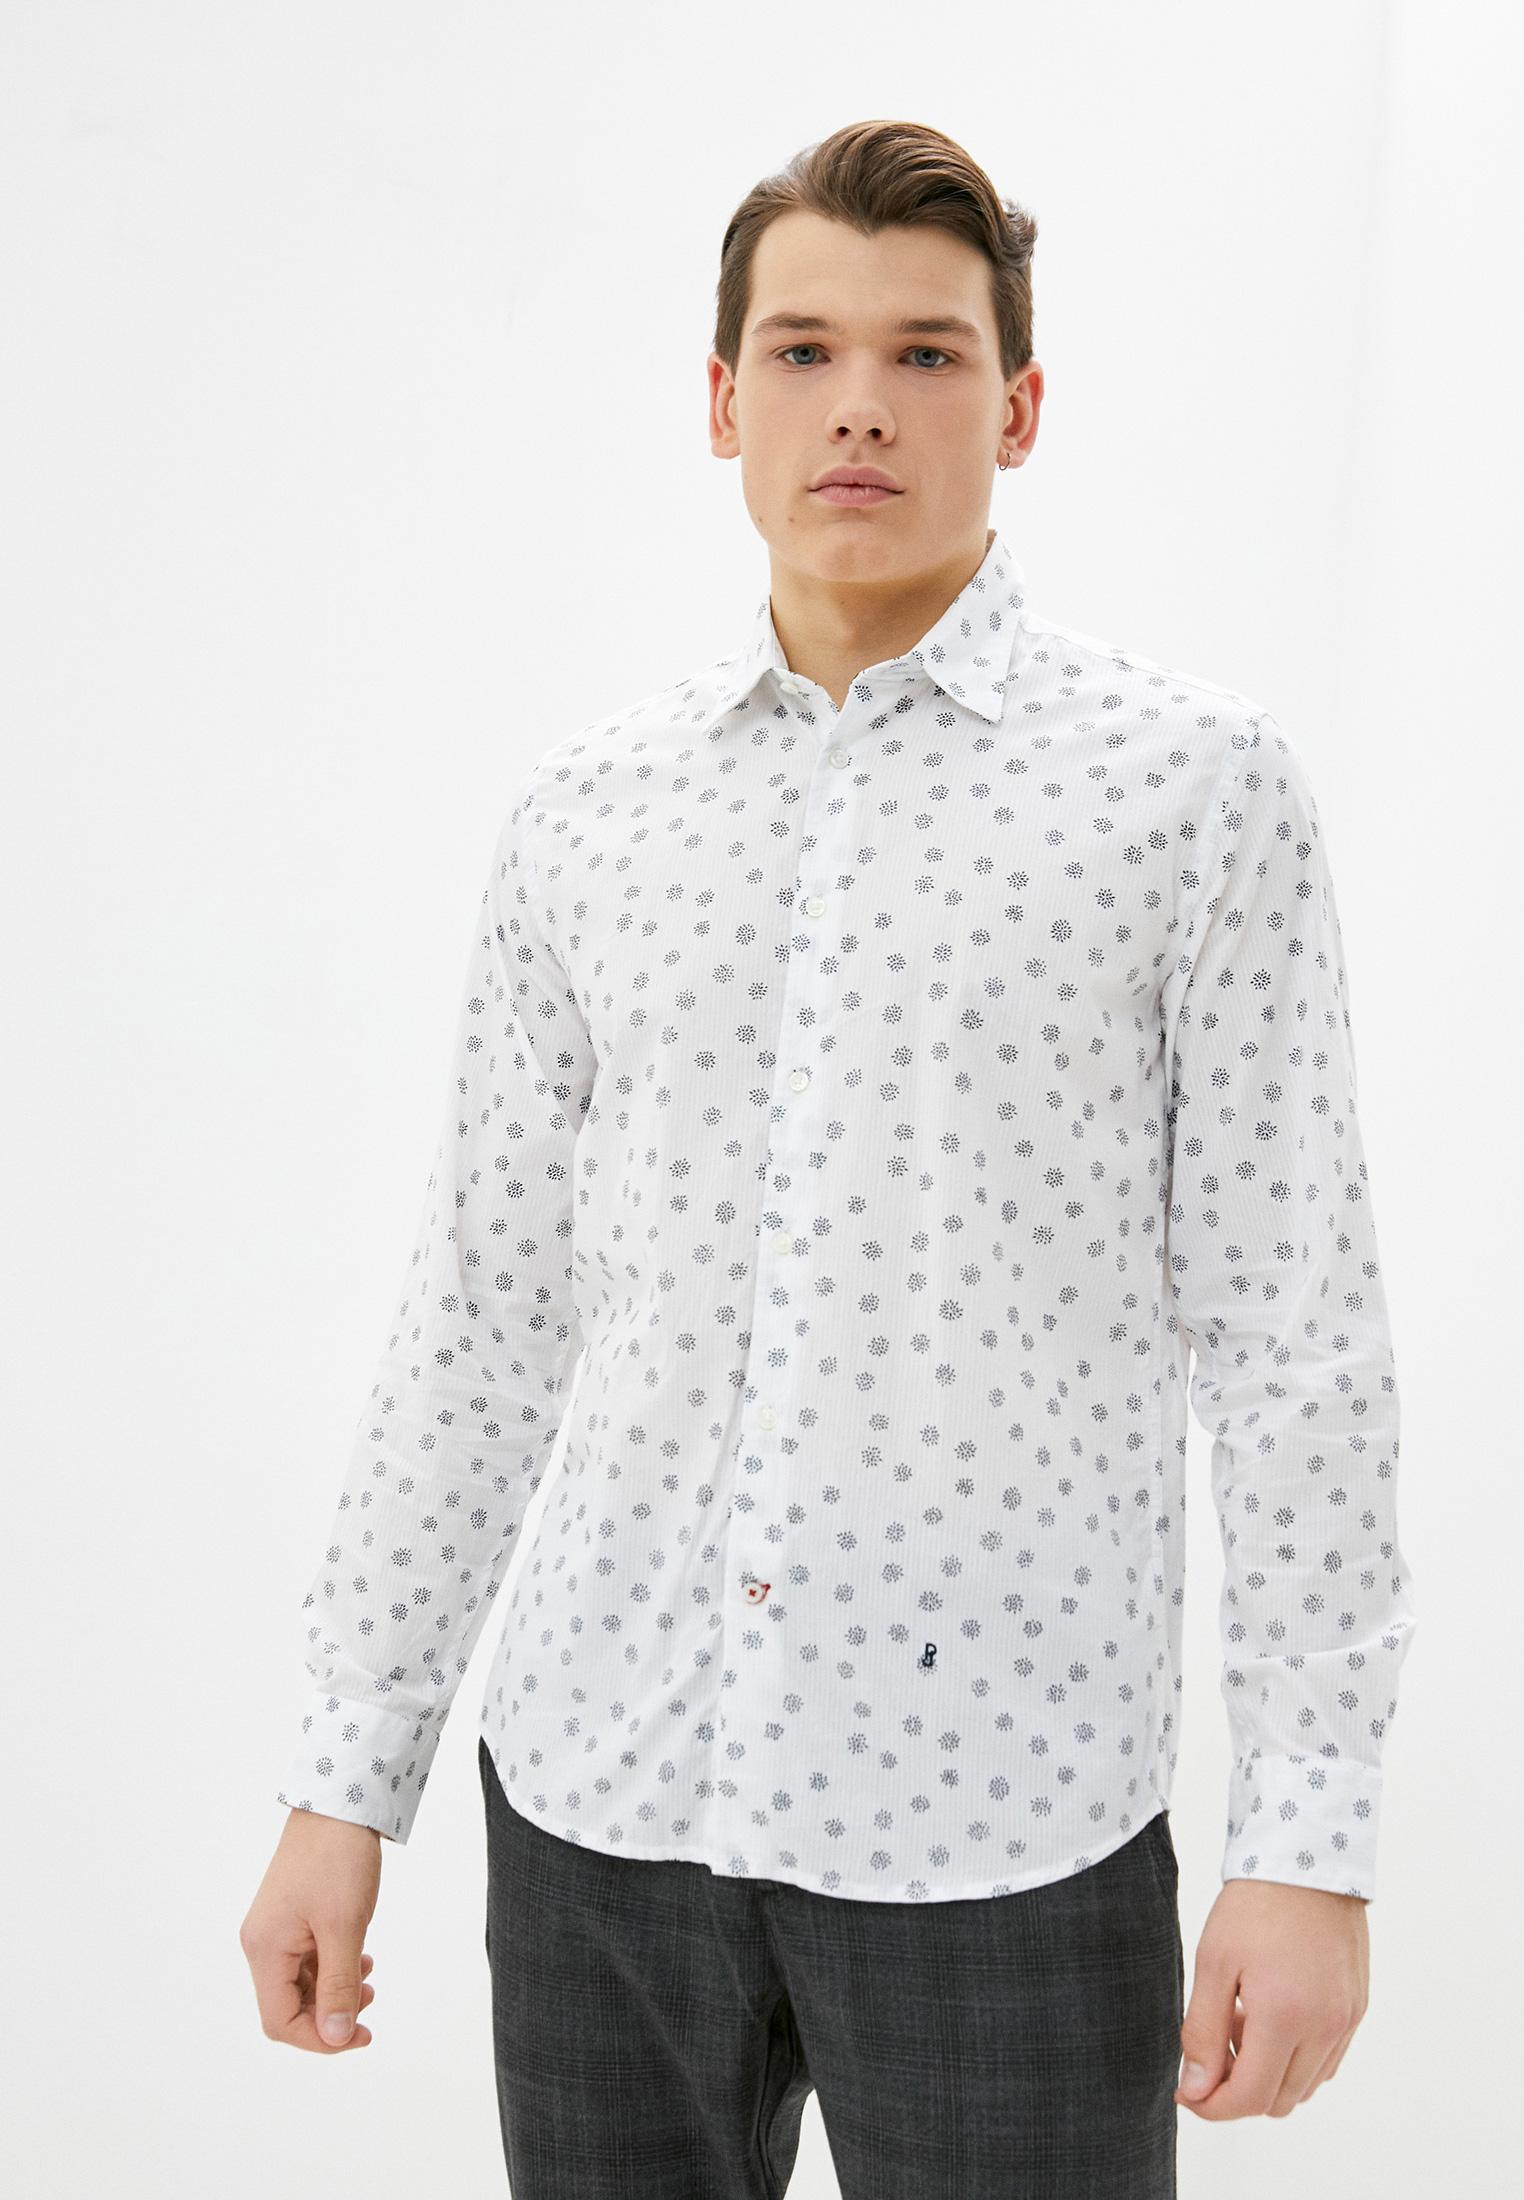 Рубашка с длинным рукавом Pepe Jeans (Пепе Джинс) PM306512